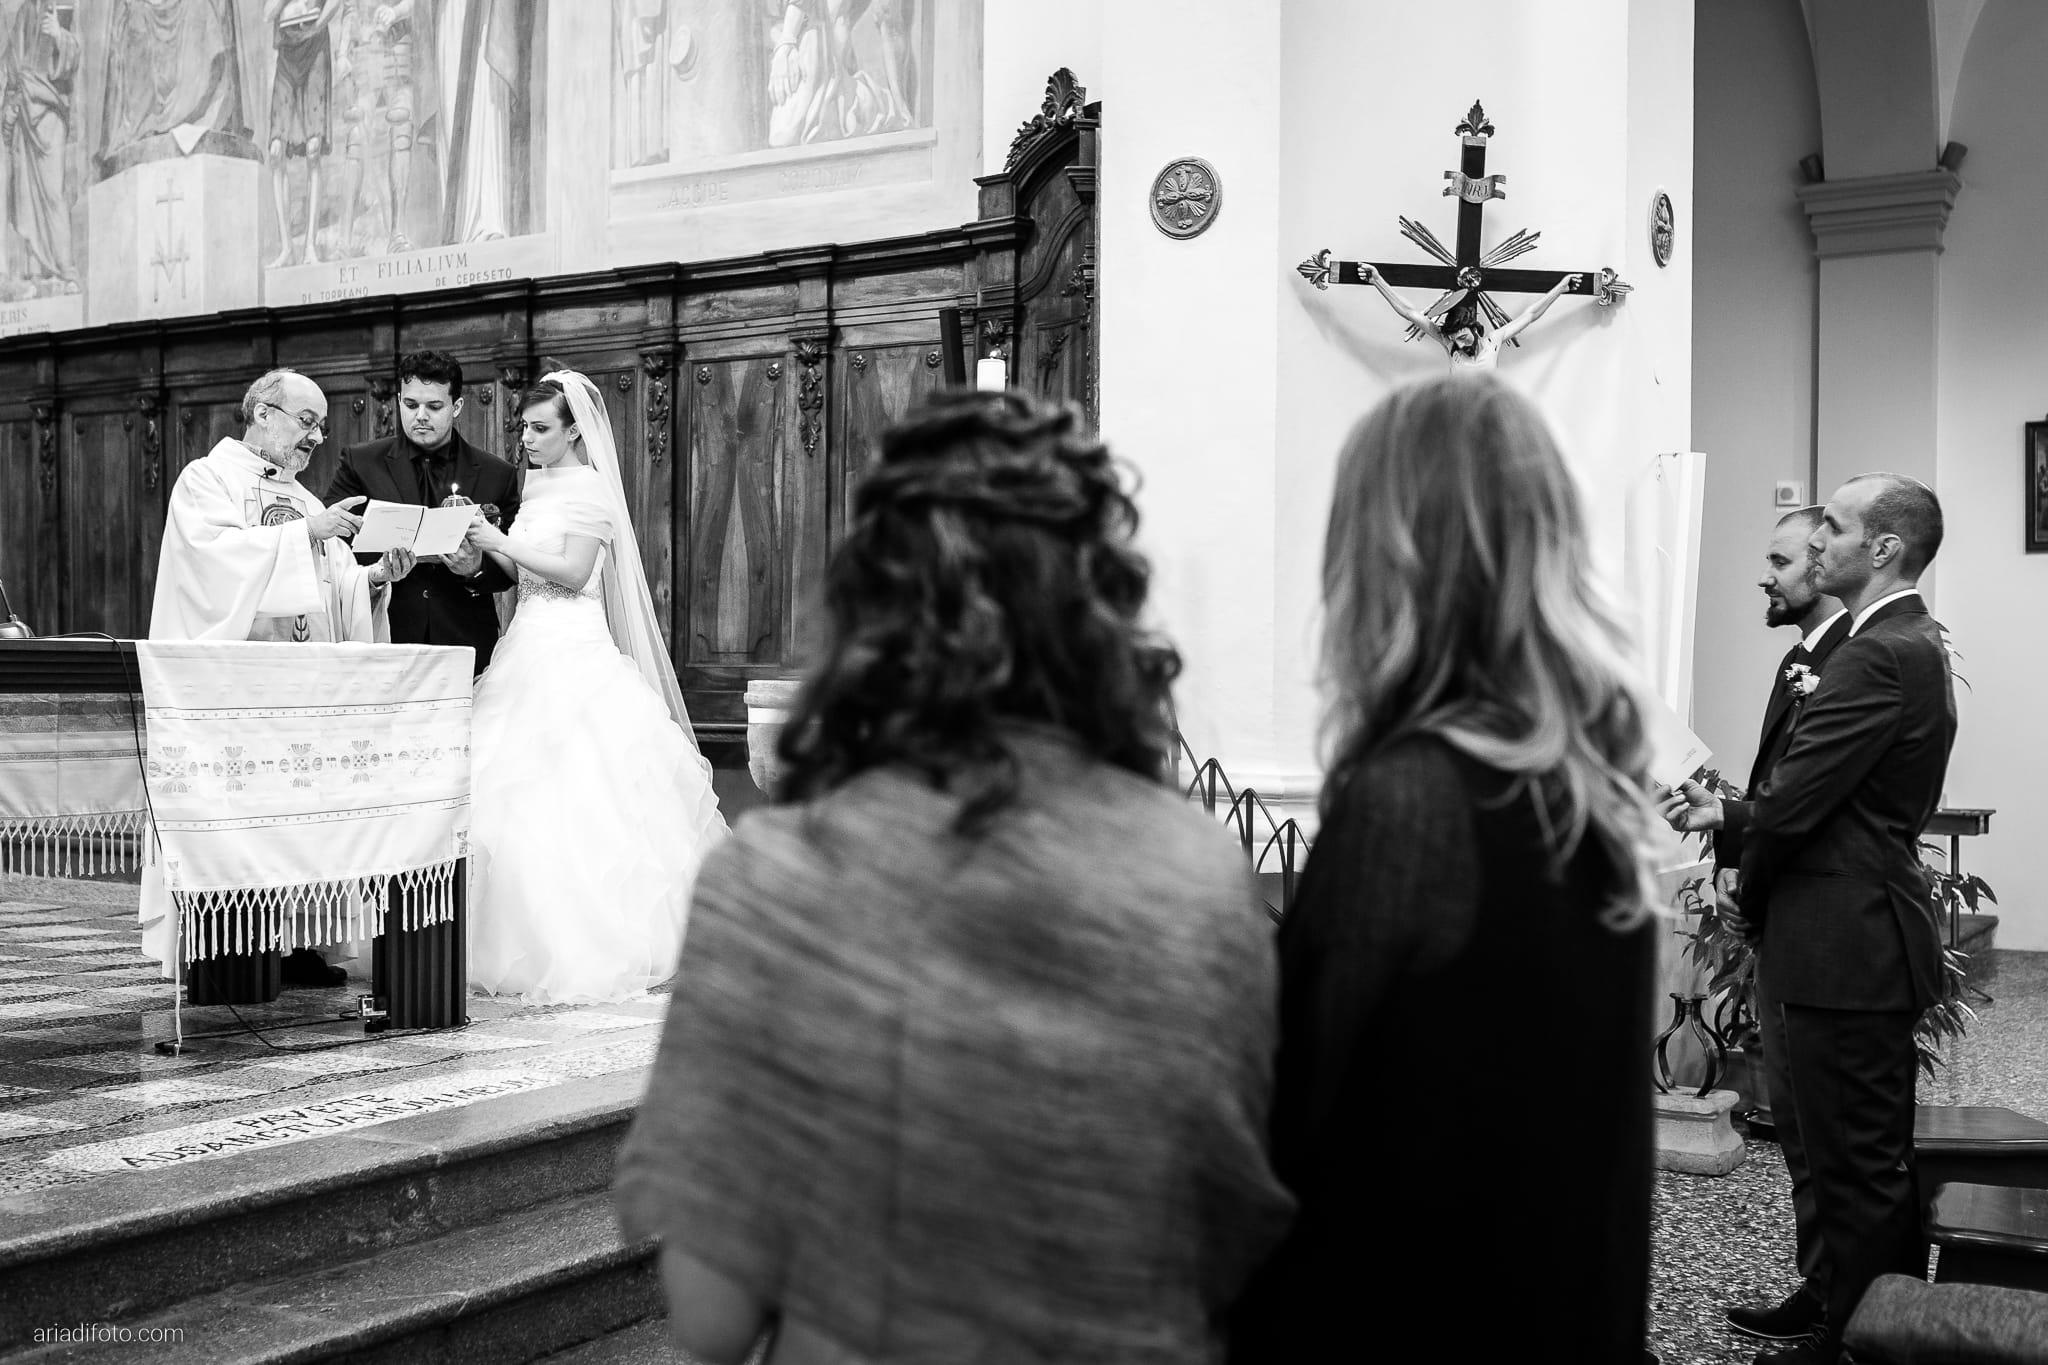 Sarah Matteo Matrimonio Moruzzo Chiesa Santa Maria Gruagno Agriturismo Il Vagabondo Buttrio Udine cerimonia candela